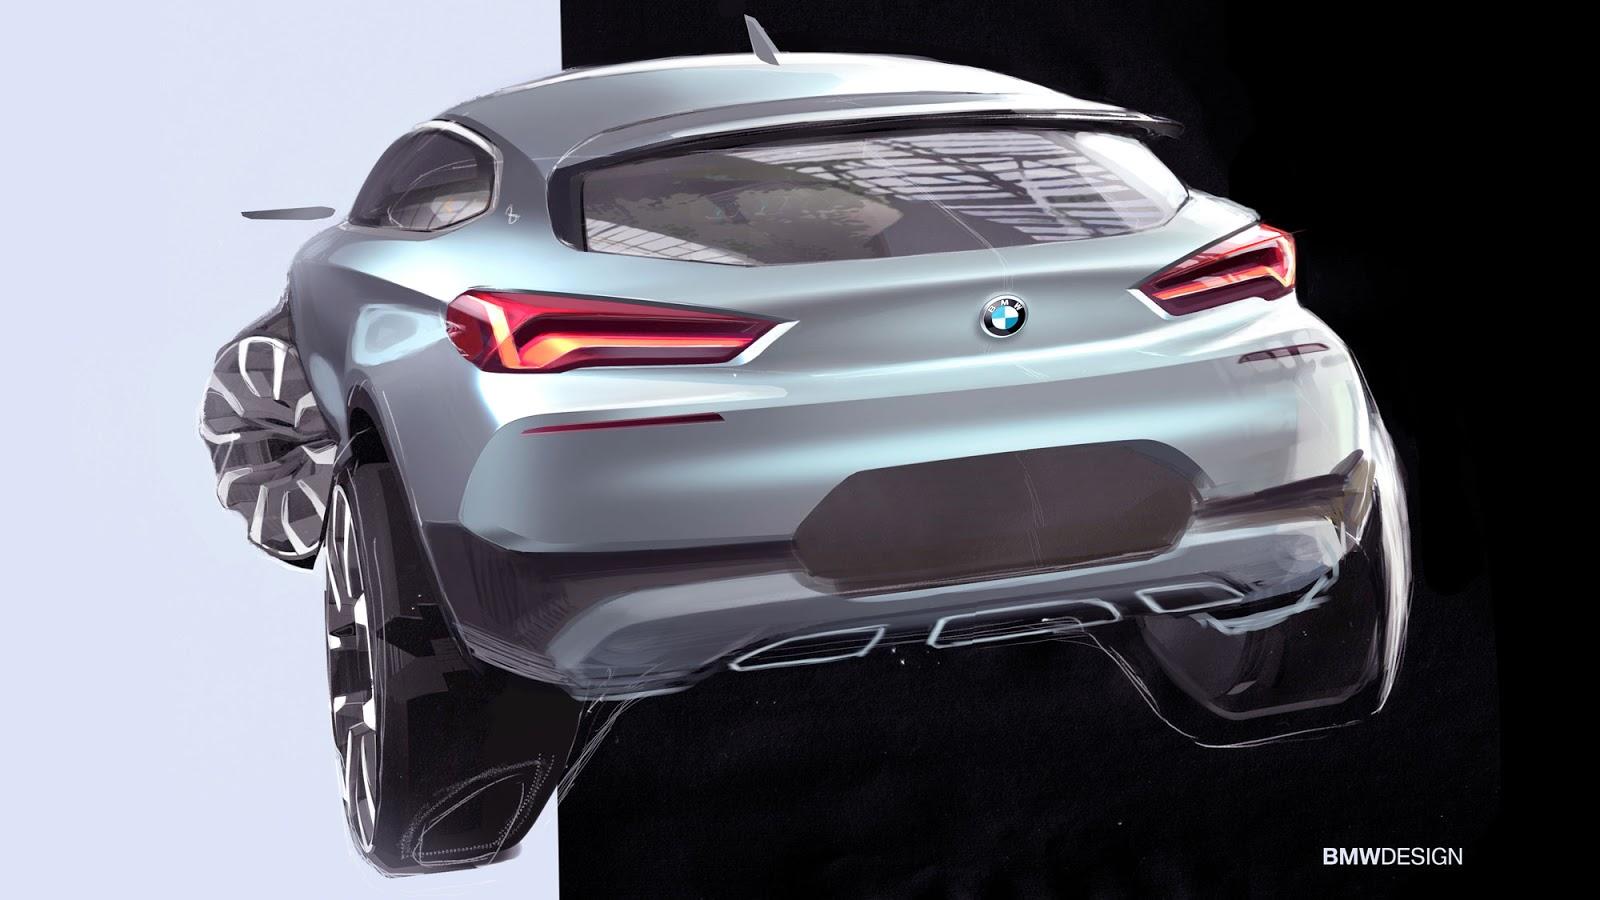 BMW X2 sketch by Sebastian Simm - rear view in silver